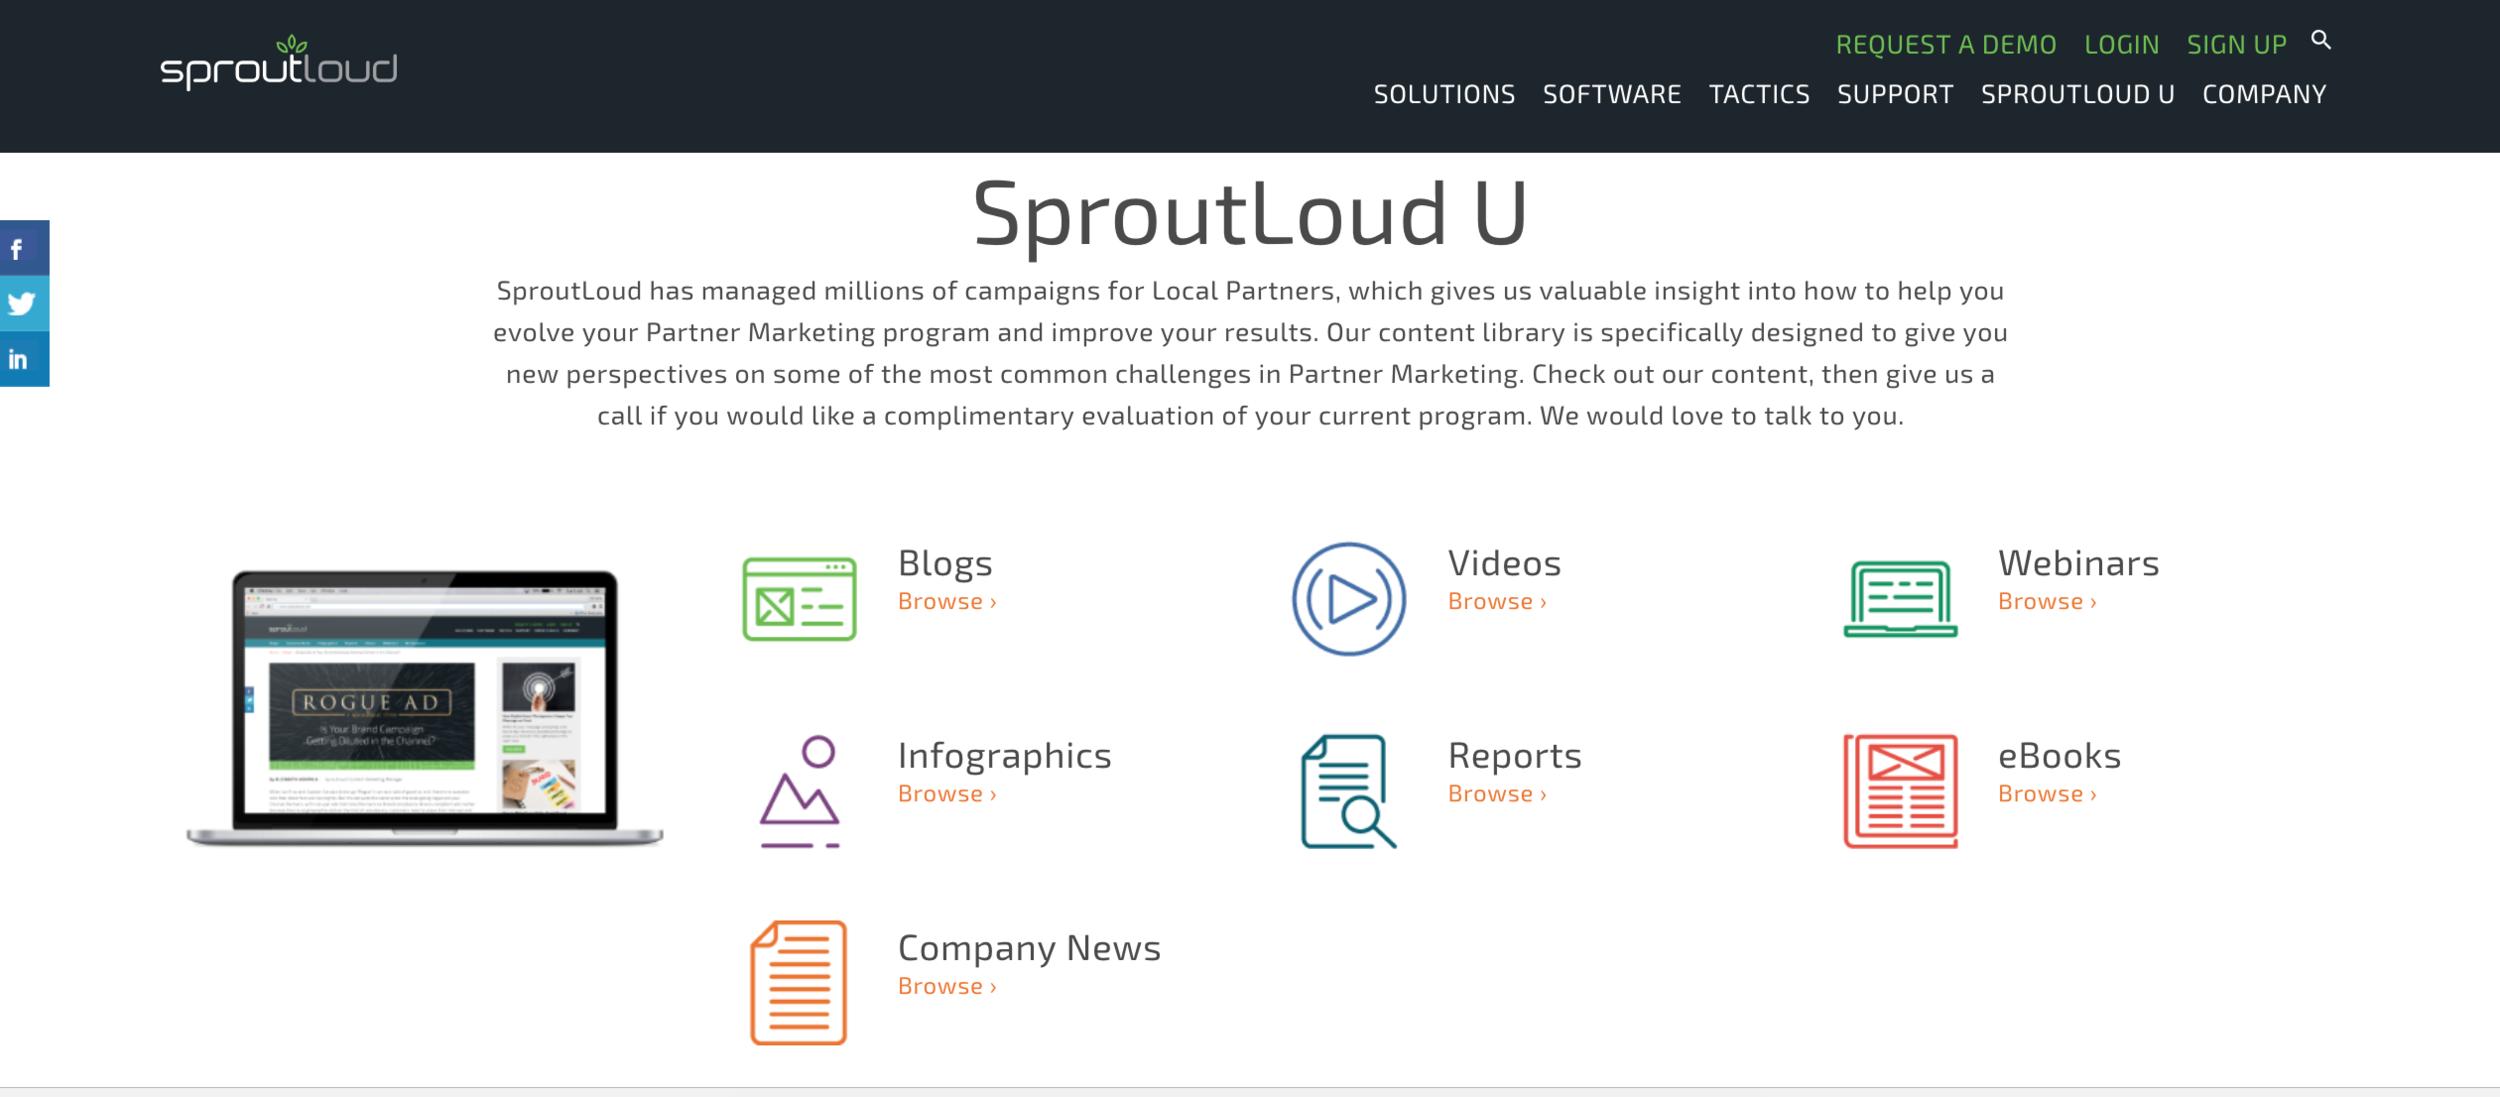 Sproutloud U